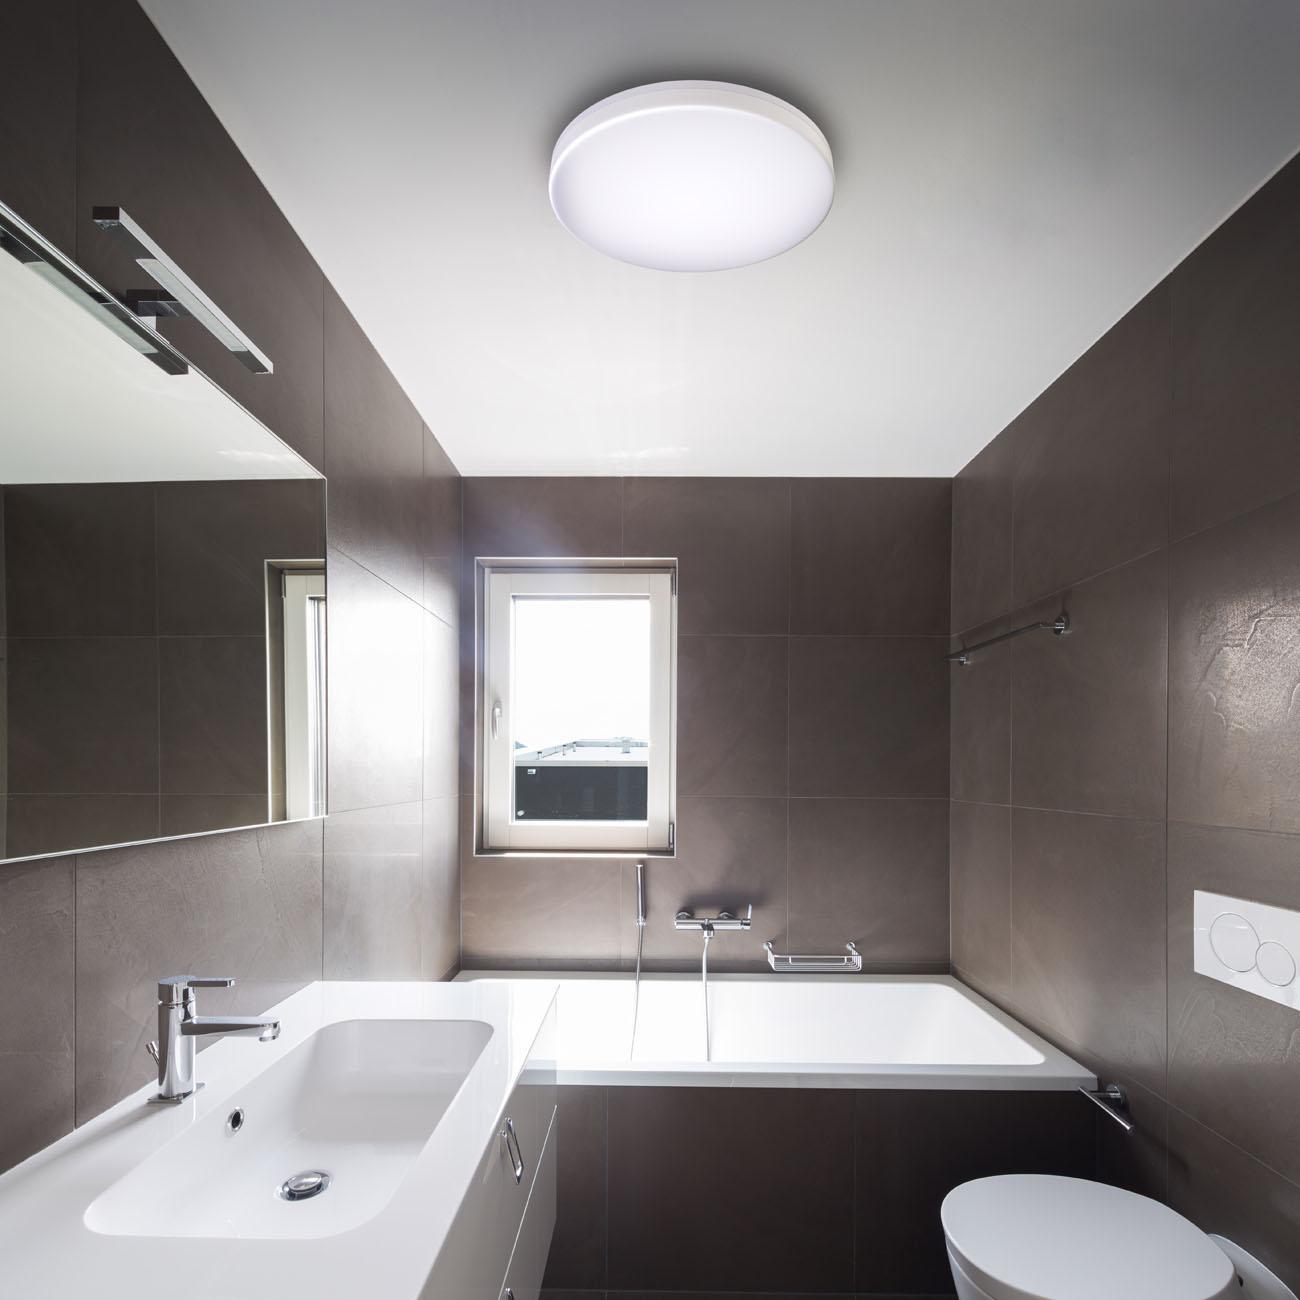 LED Deckenleuchte Badlampe IP54 L